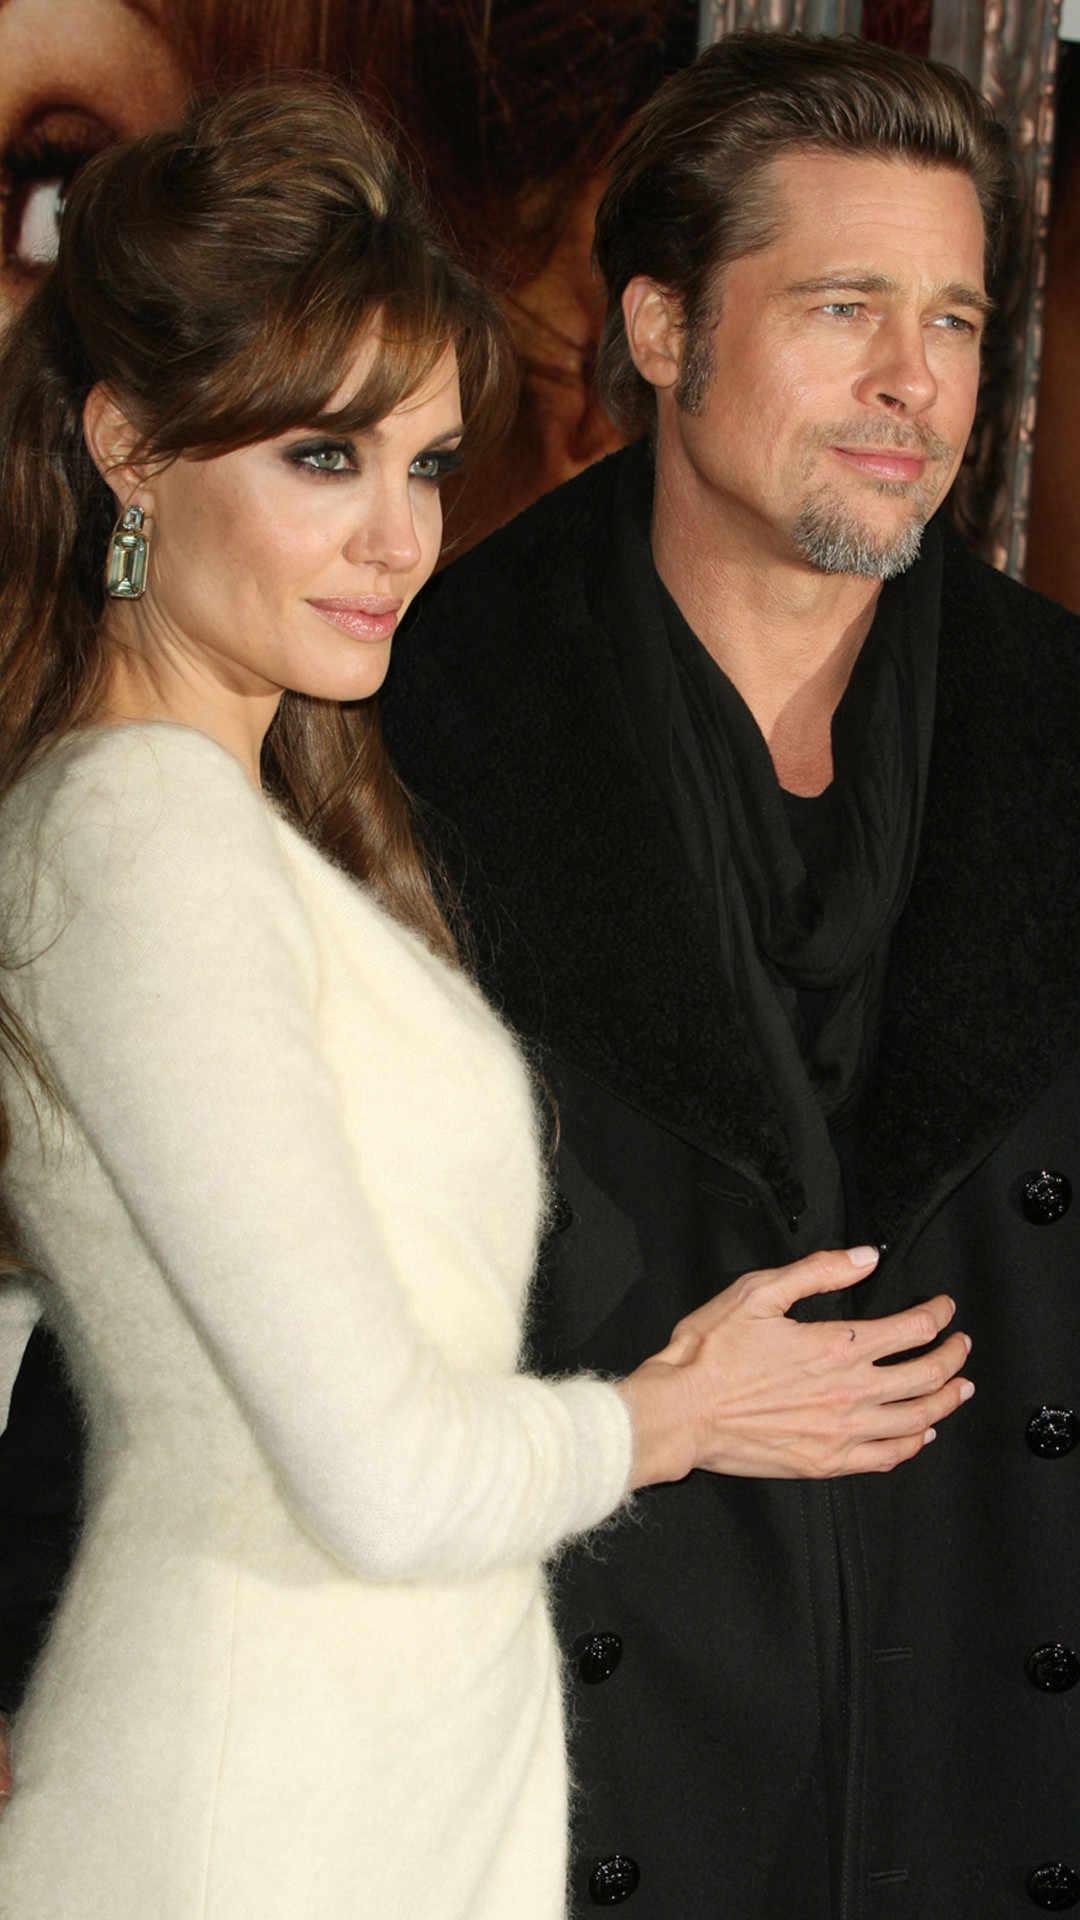 Couples Collage, Brad Pitt, Angelina Jolie, Chris Martin, Gwyneth Paltrow, Chris Pratt, Anna Faris